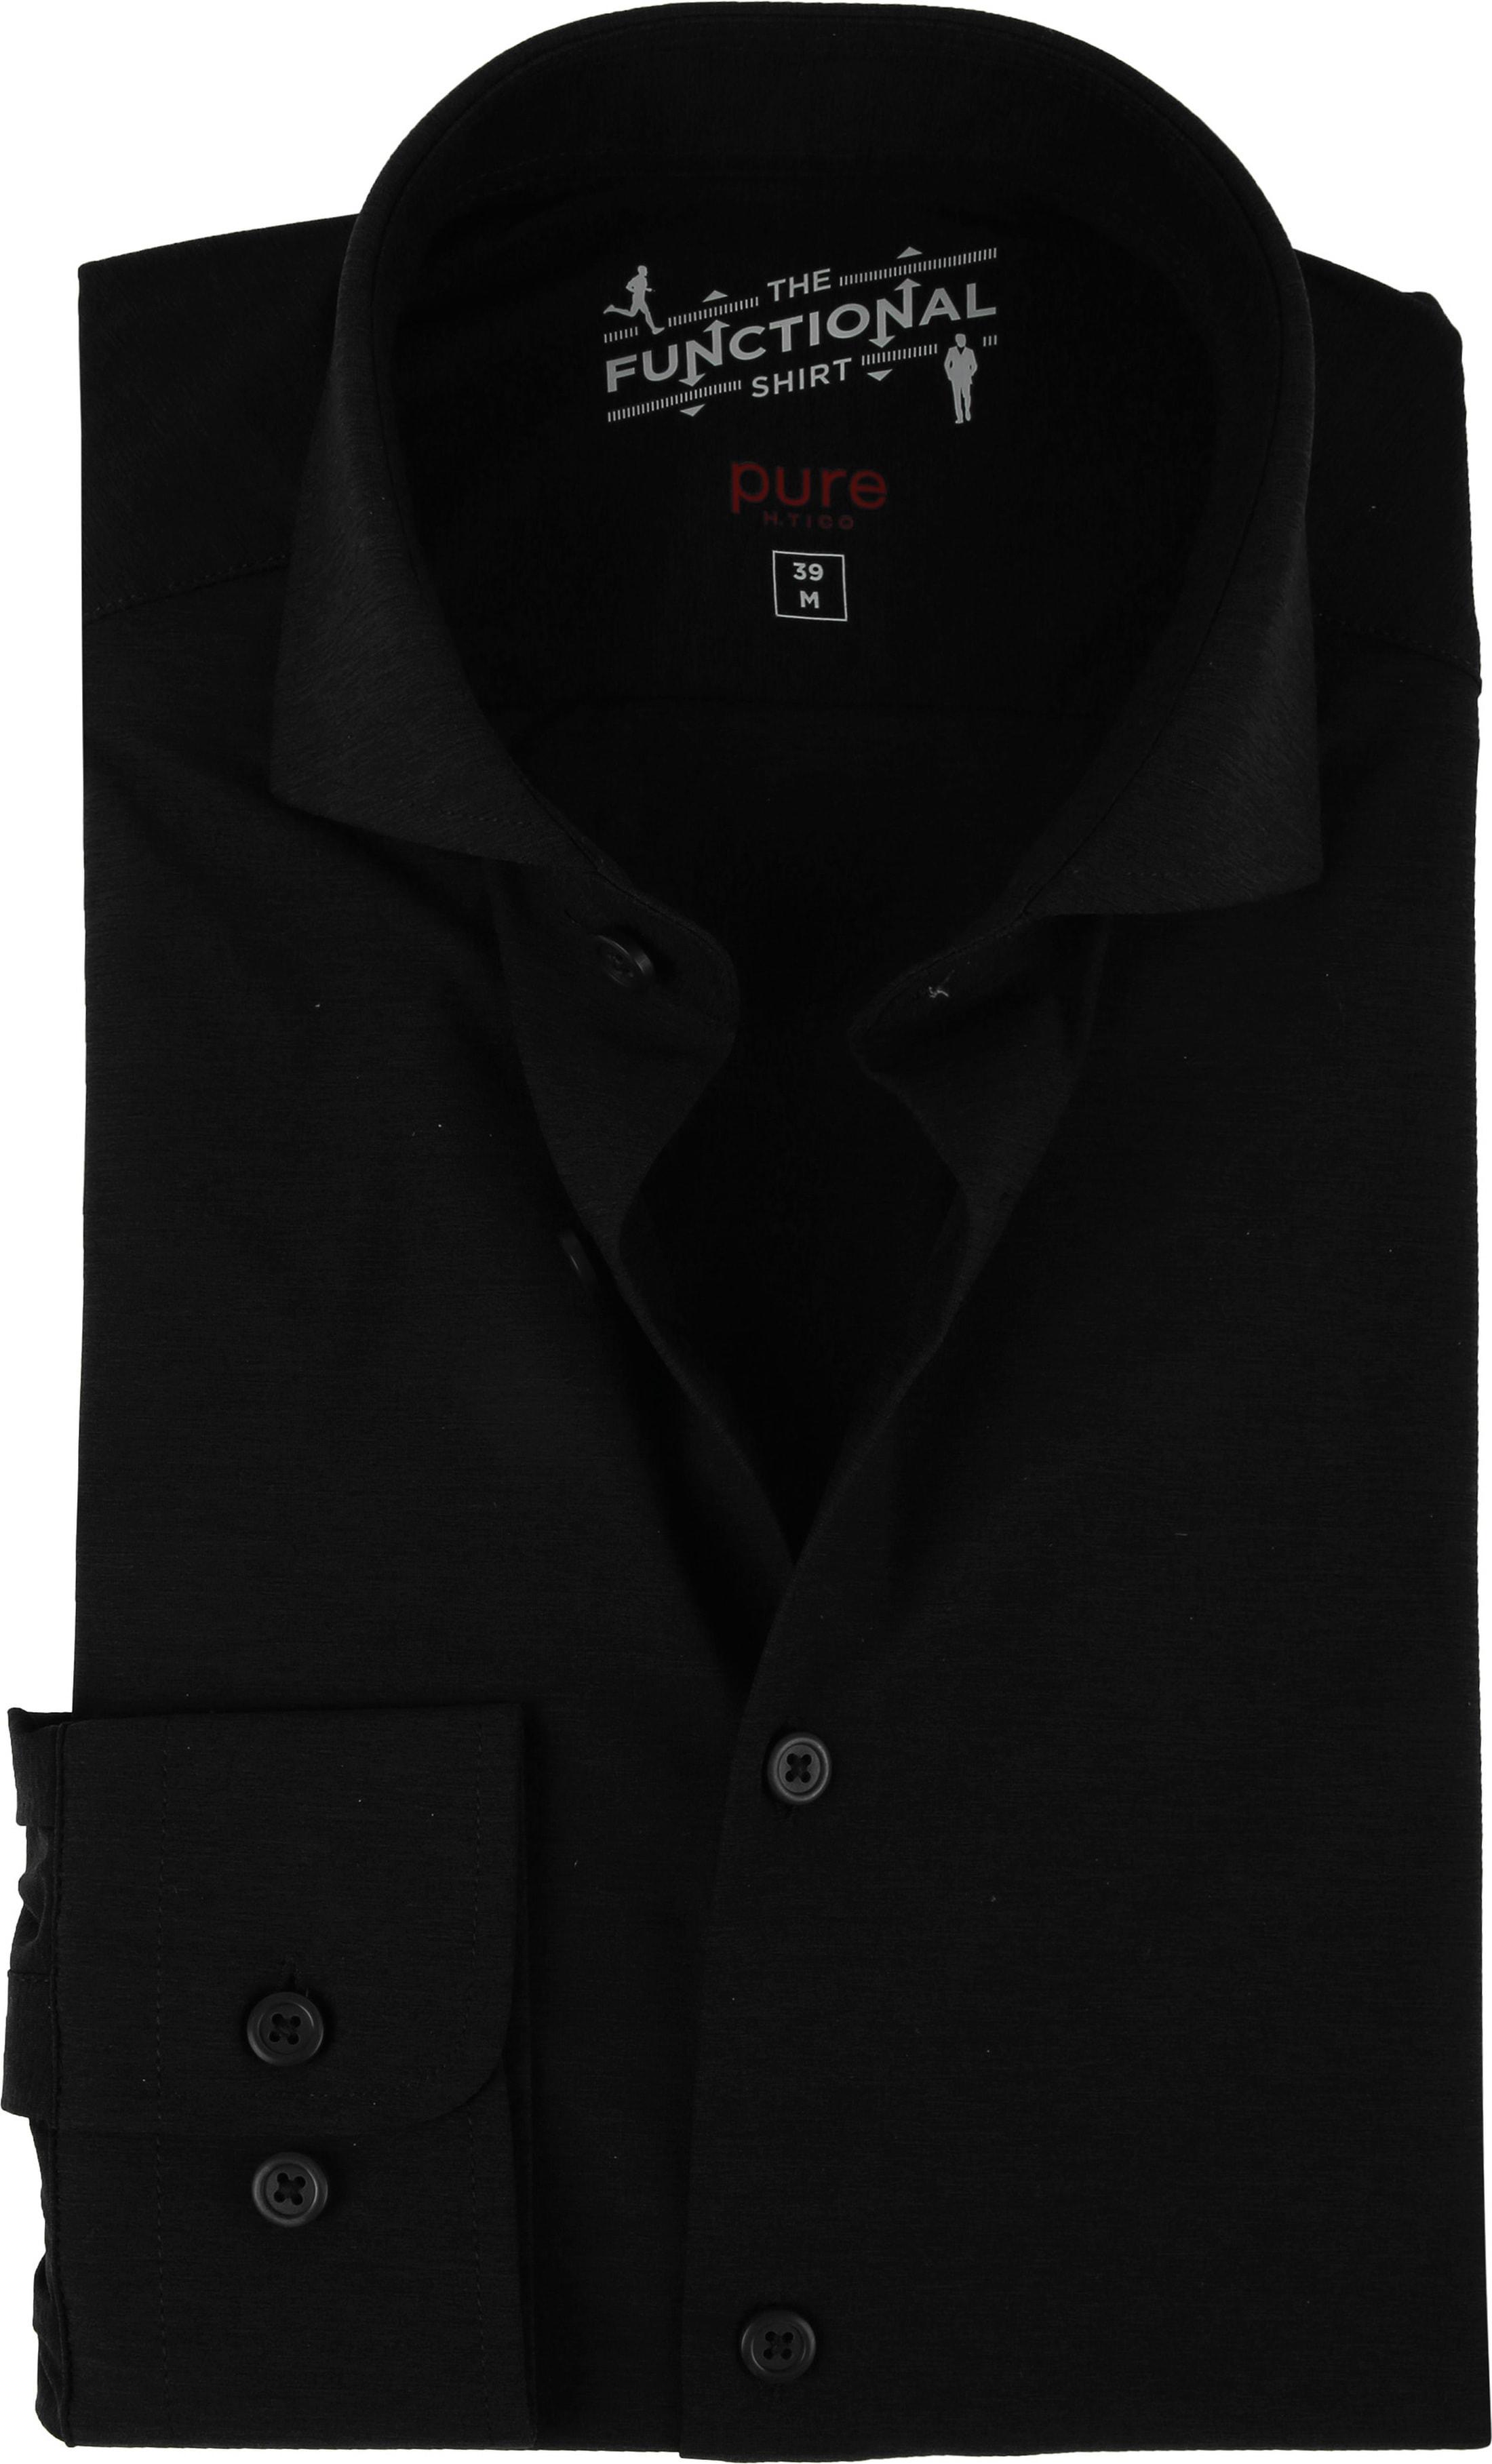 Pure H.Tico The Functional Shirt Zwart